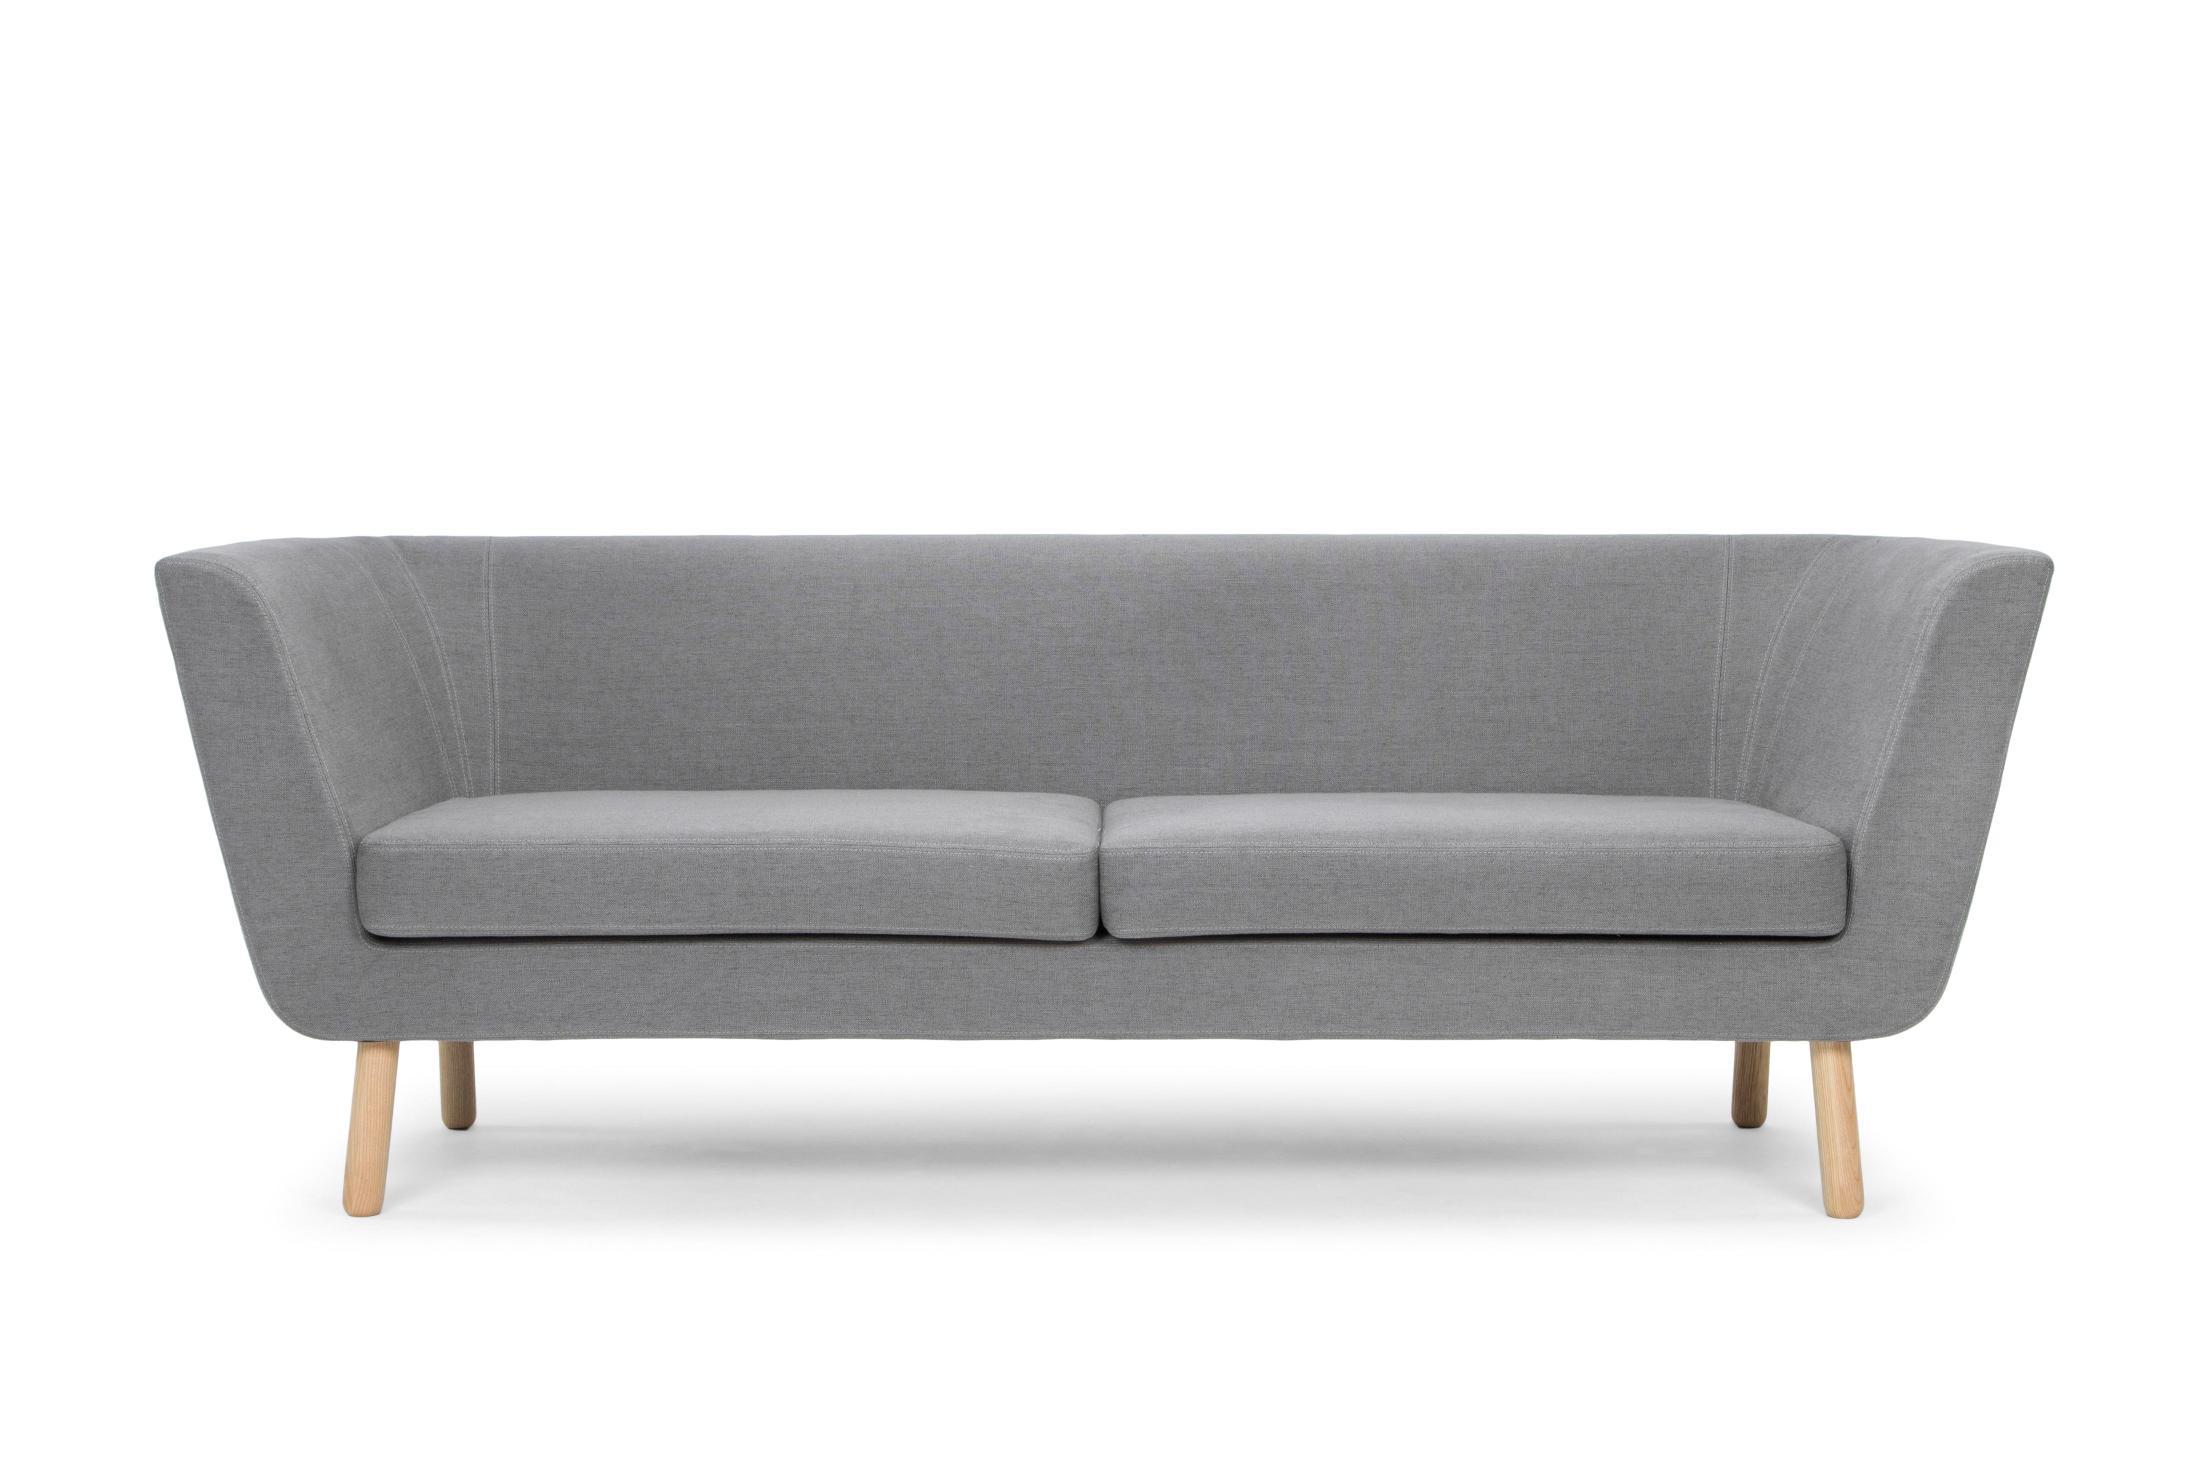 Design House Stockolm, divano Nest Grigio chiaro, Newformsdesign ...